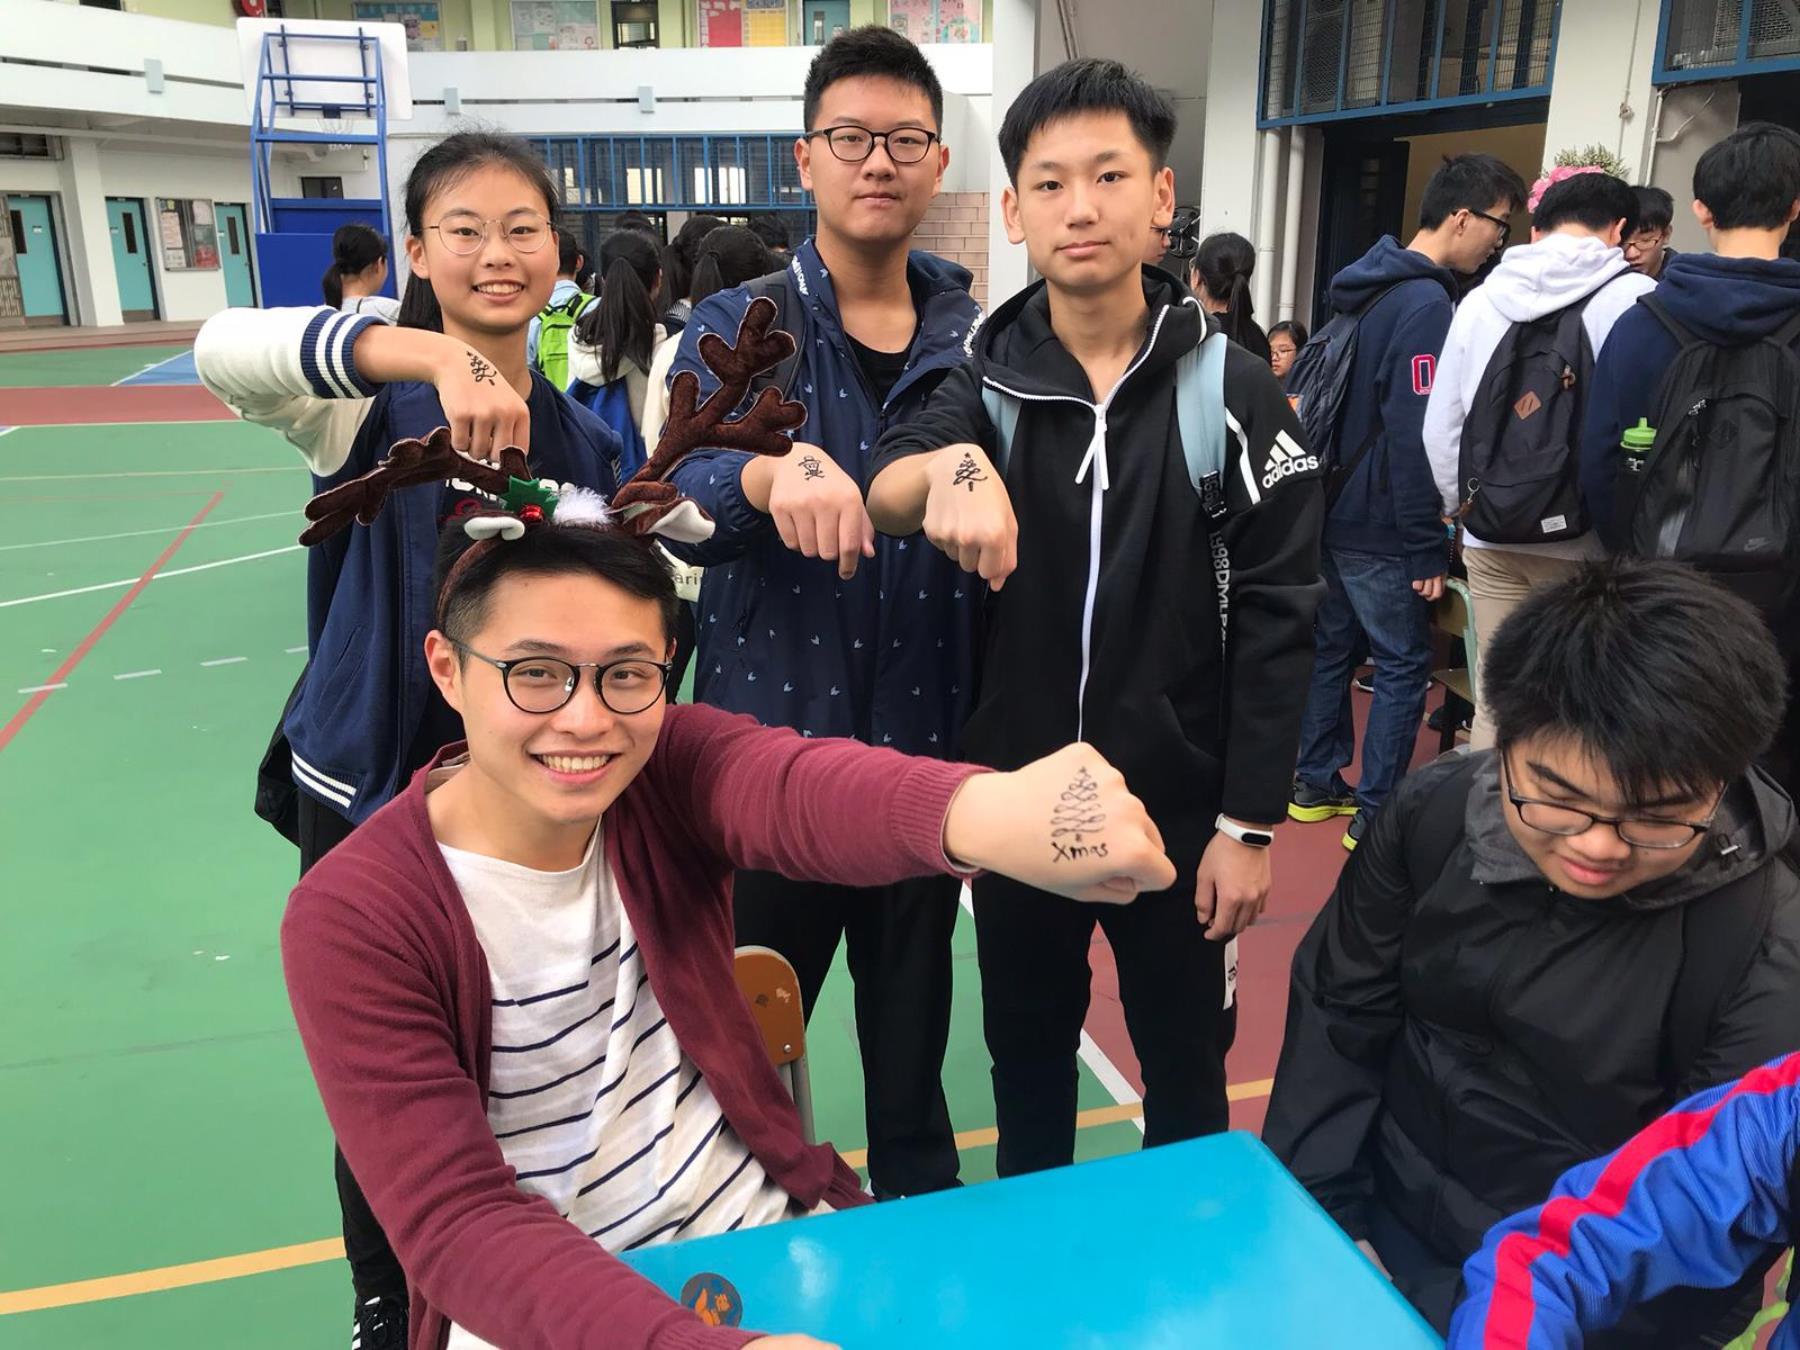 https://npc.edu.hk/sites/default/files/img-20190102-wa0003_1.jpg